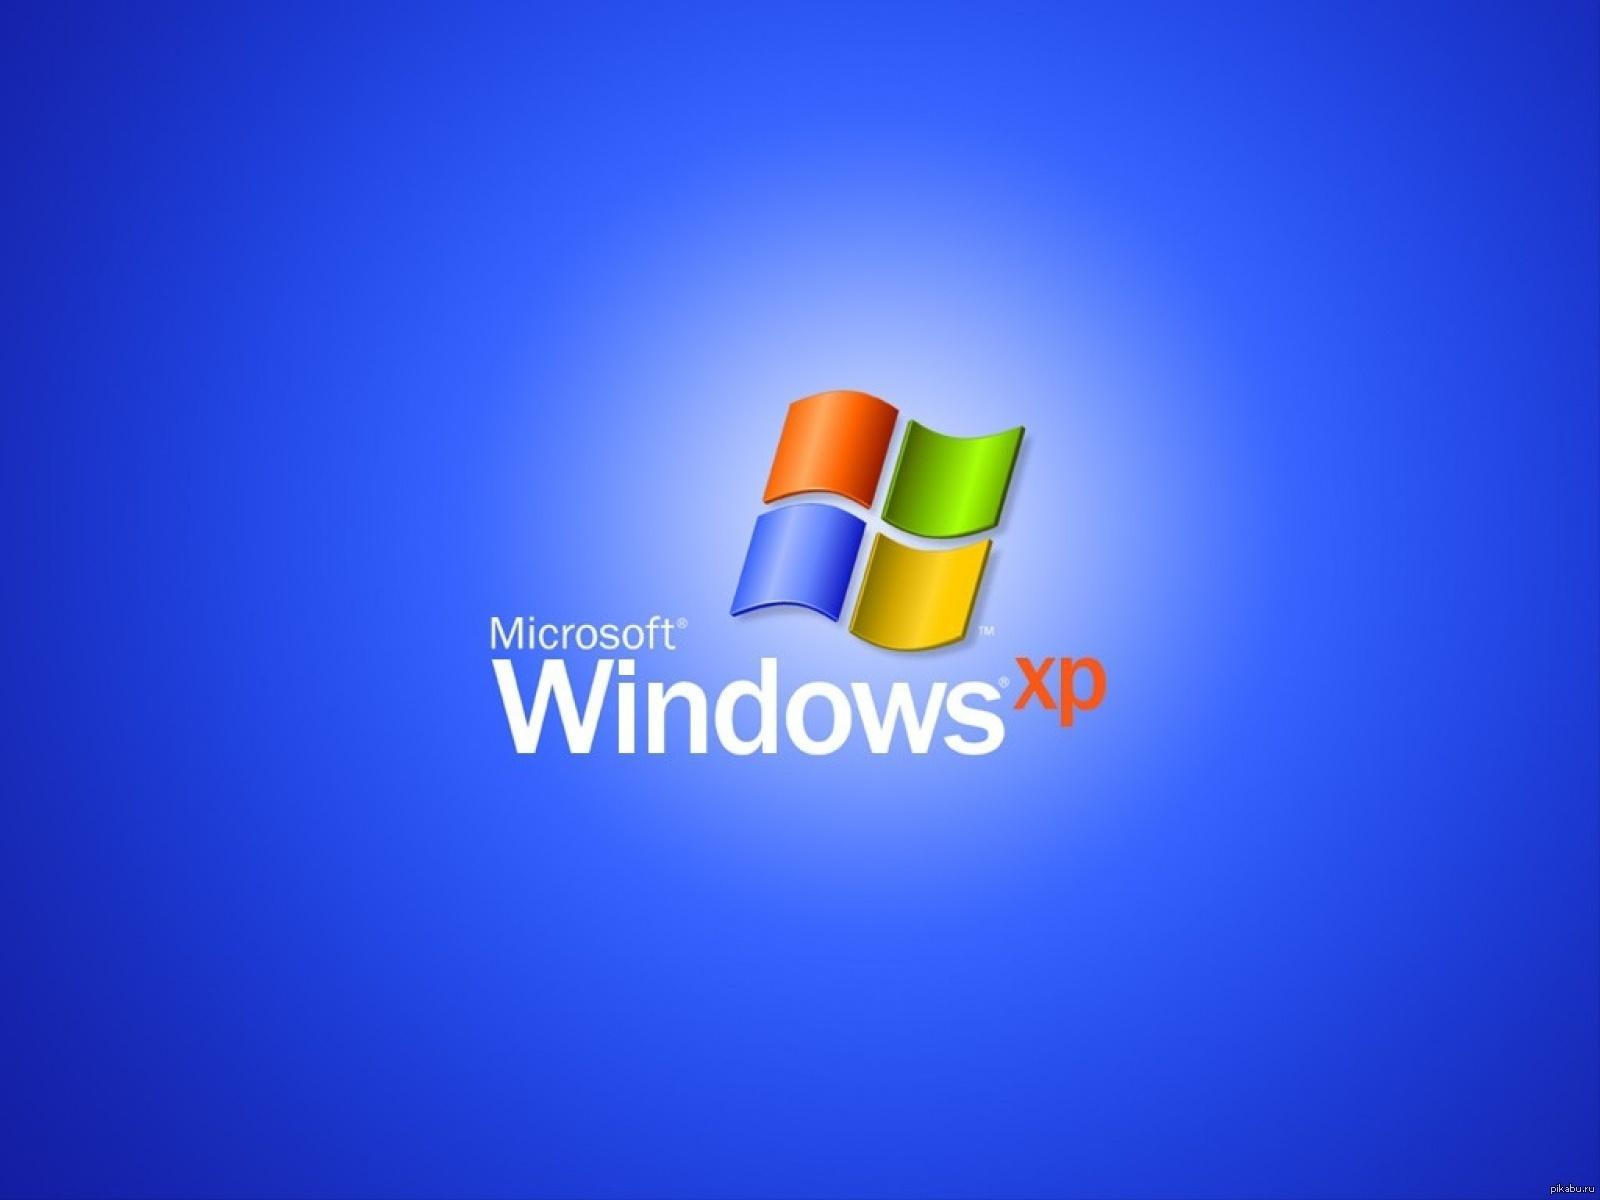 Как переустановить Windows XP?